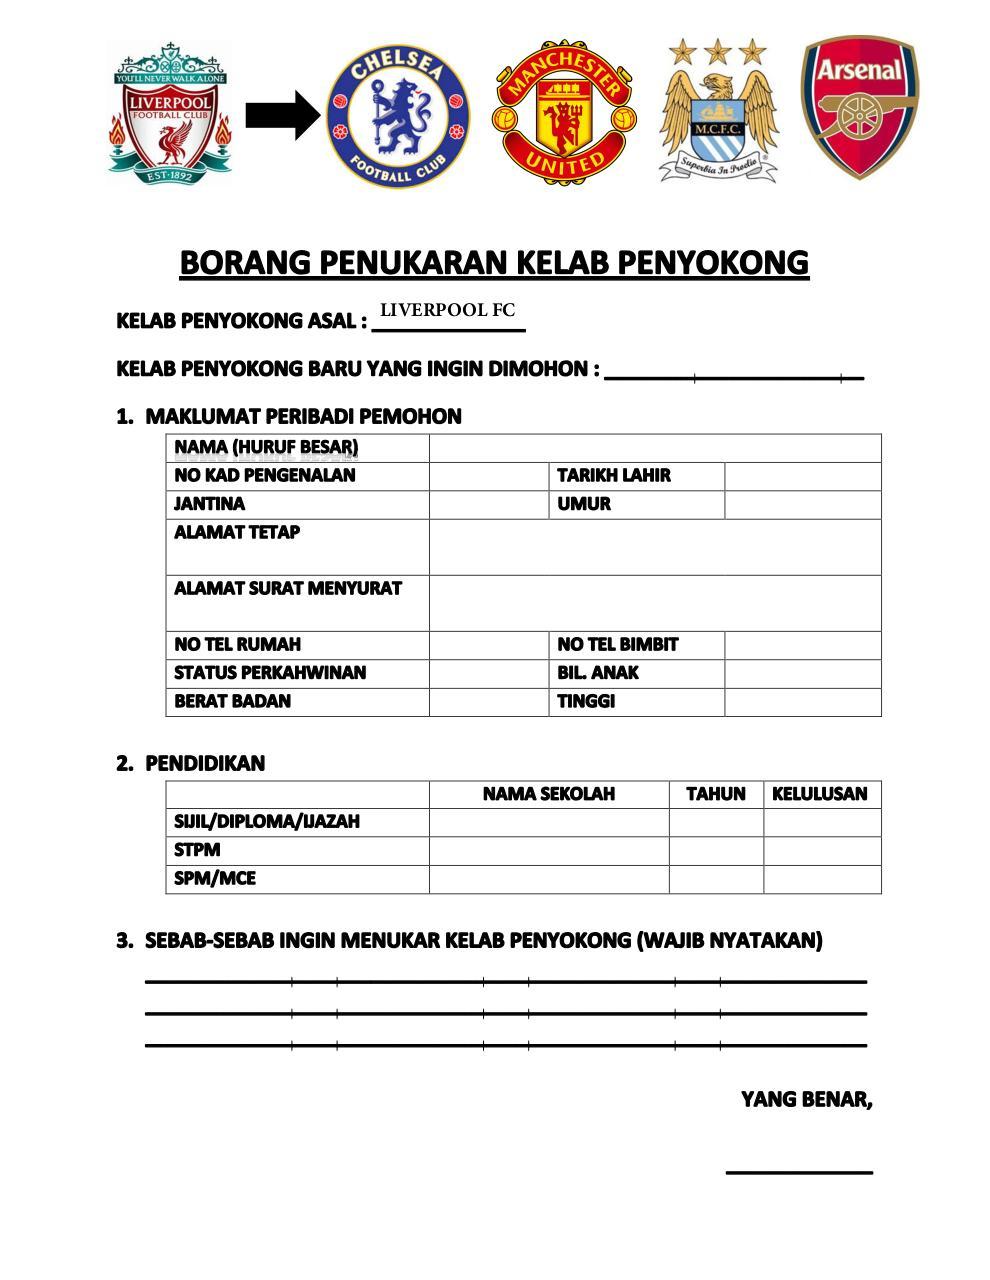 Borang Tukar Team By User Borang Tukar Team Liverpool Ke Kelab